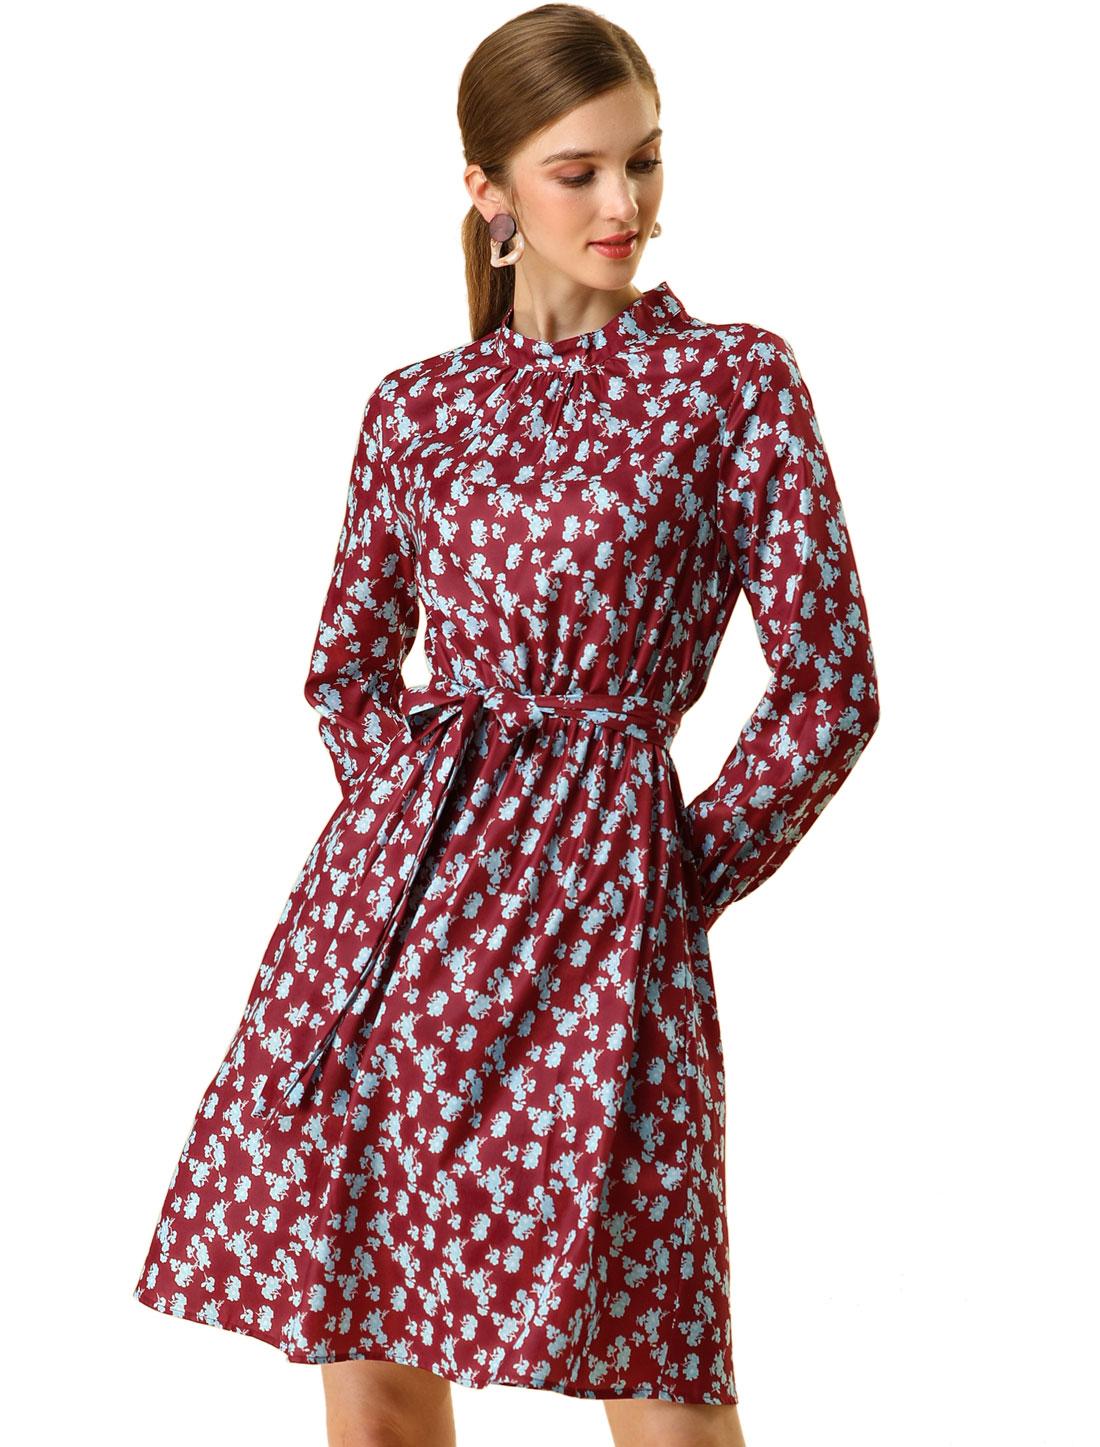 Allegra K Women's Floral Flare Long Sleeve Tie Waist A-line Dress Red L